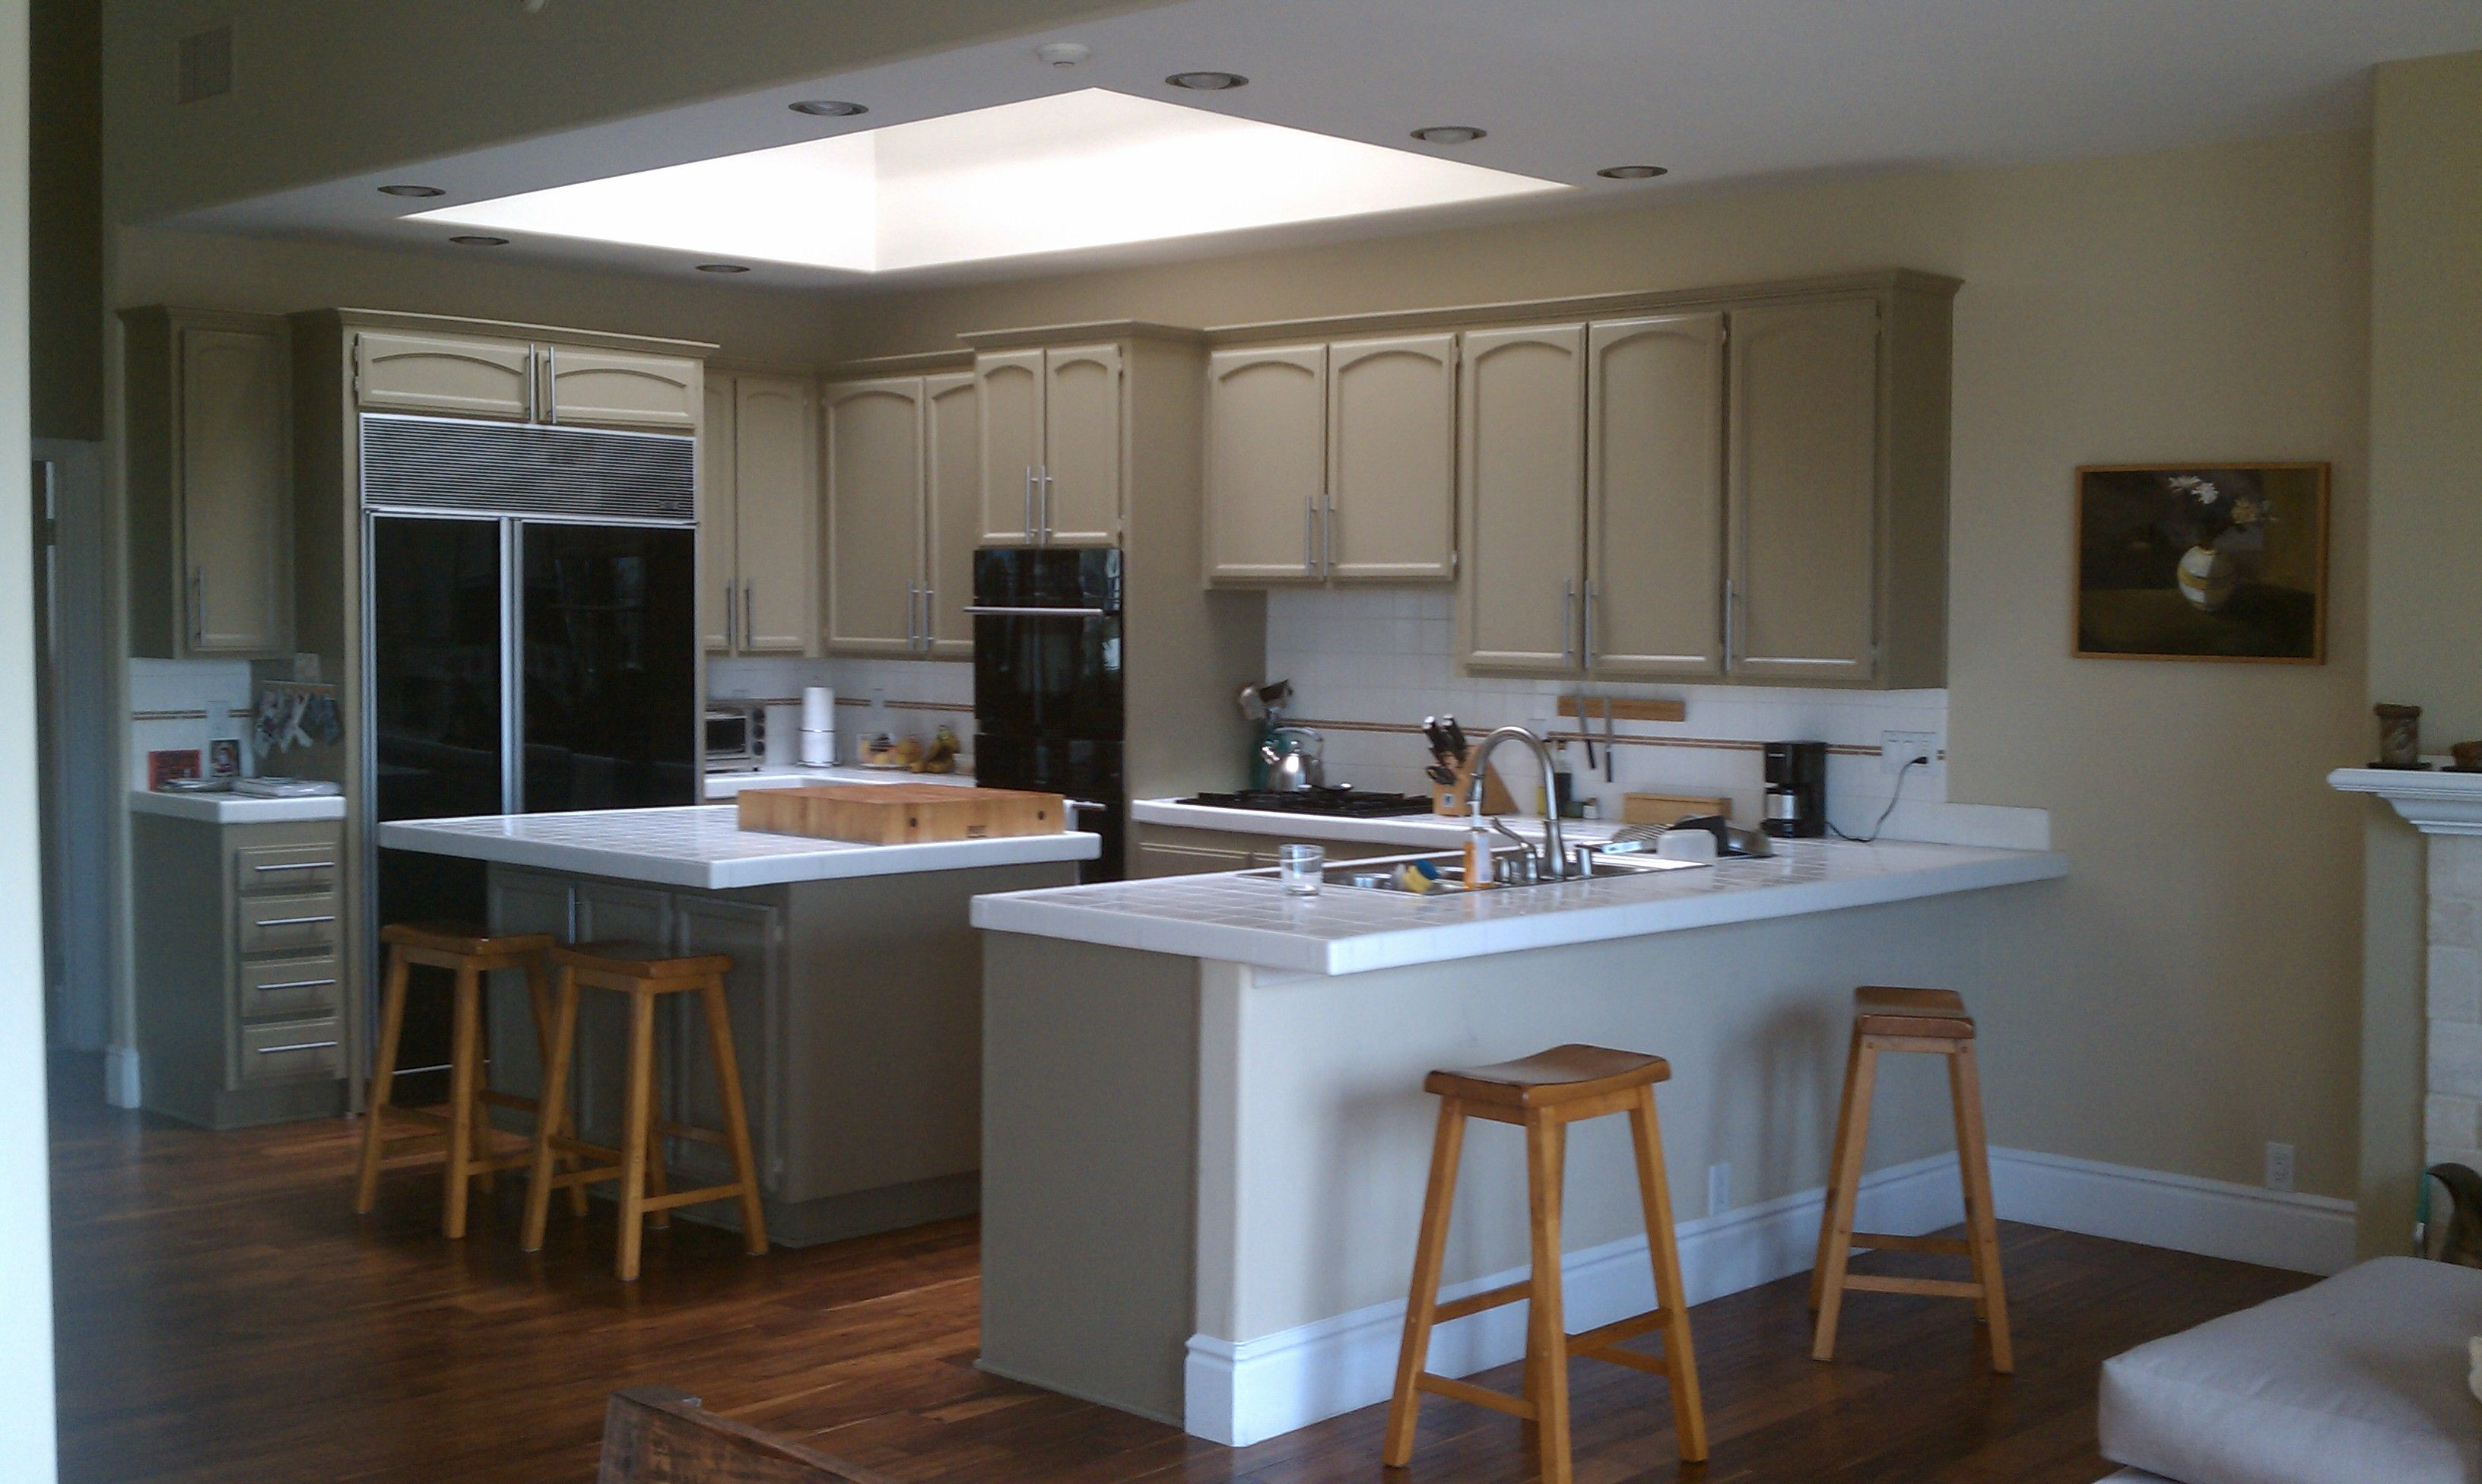 Resplendent Small Kitchen Ideas With Gray Polished Ikea Kitchen Prepossessing Designer Kitchen Cupboards Decorating Design